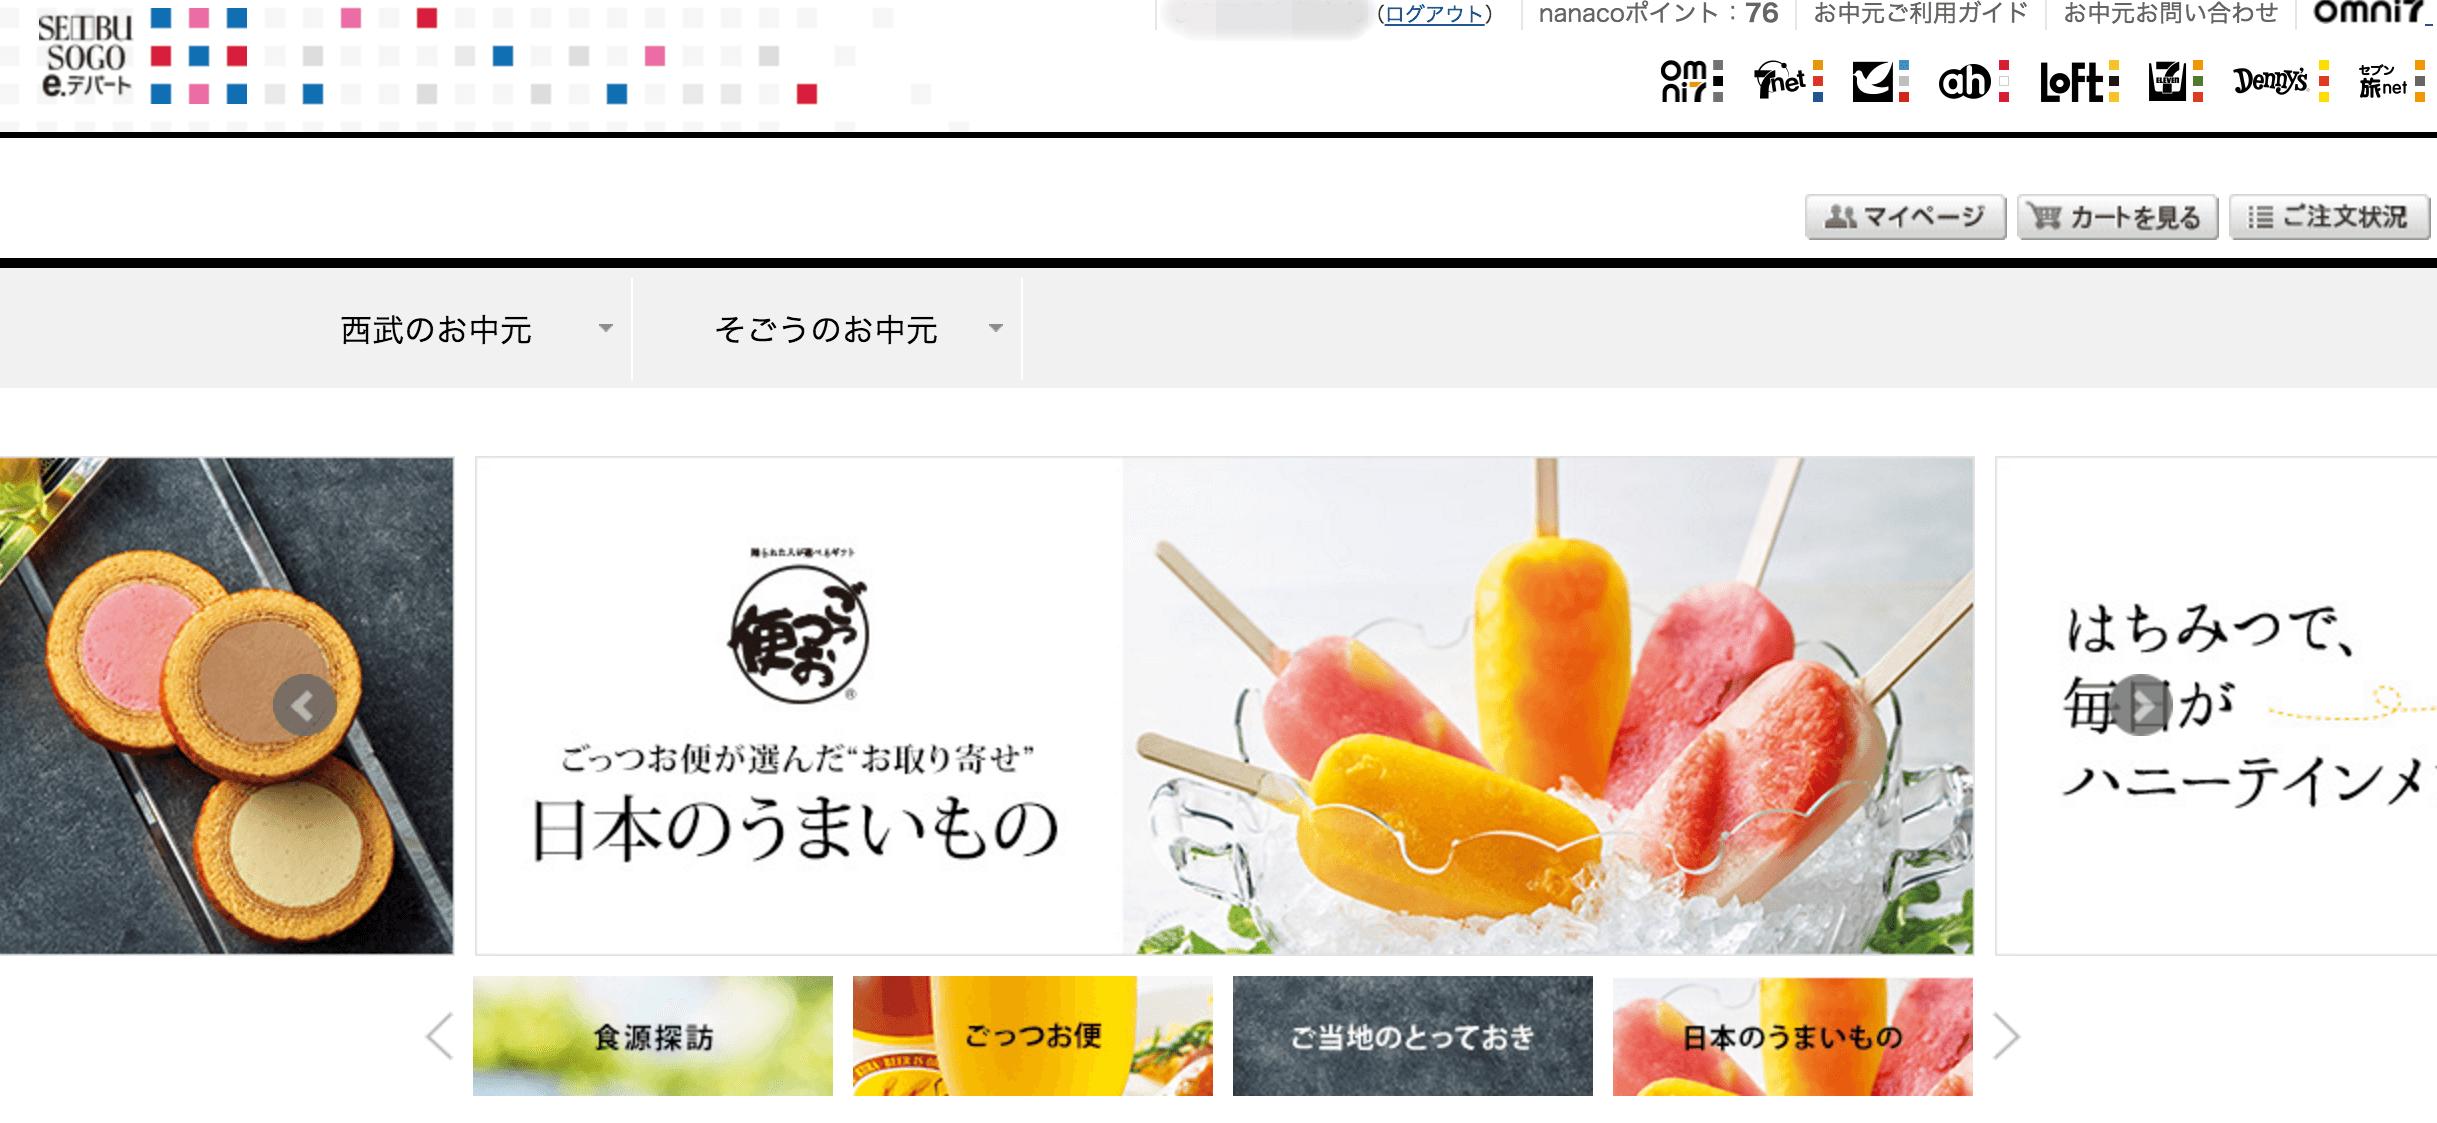 seibu_2016-05-19 10.23.46